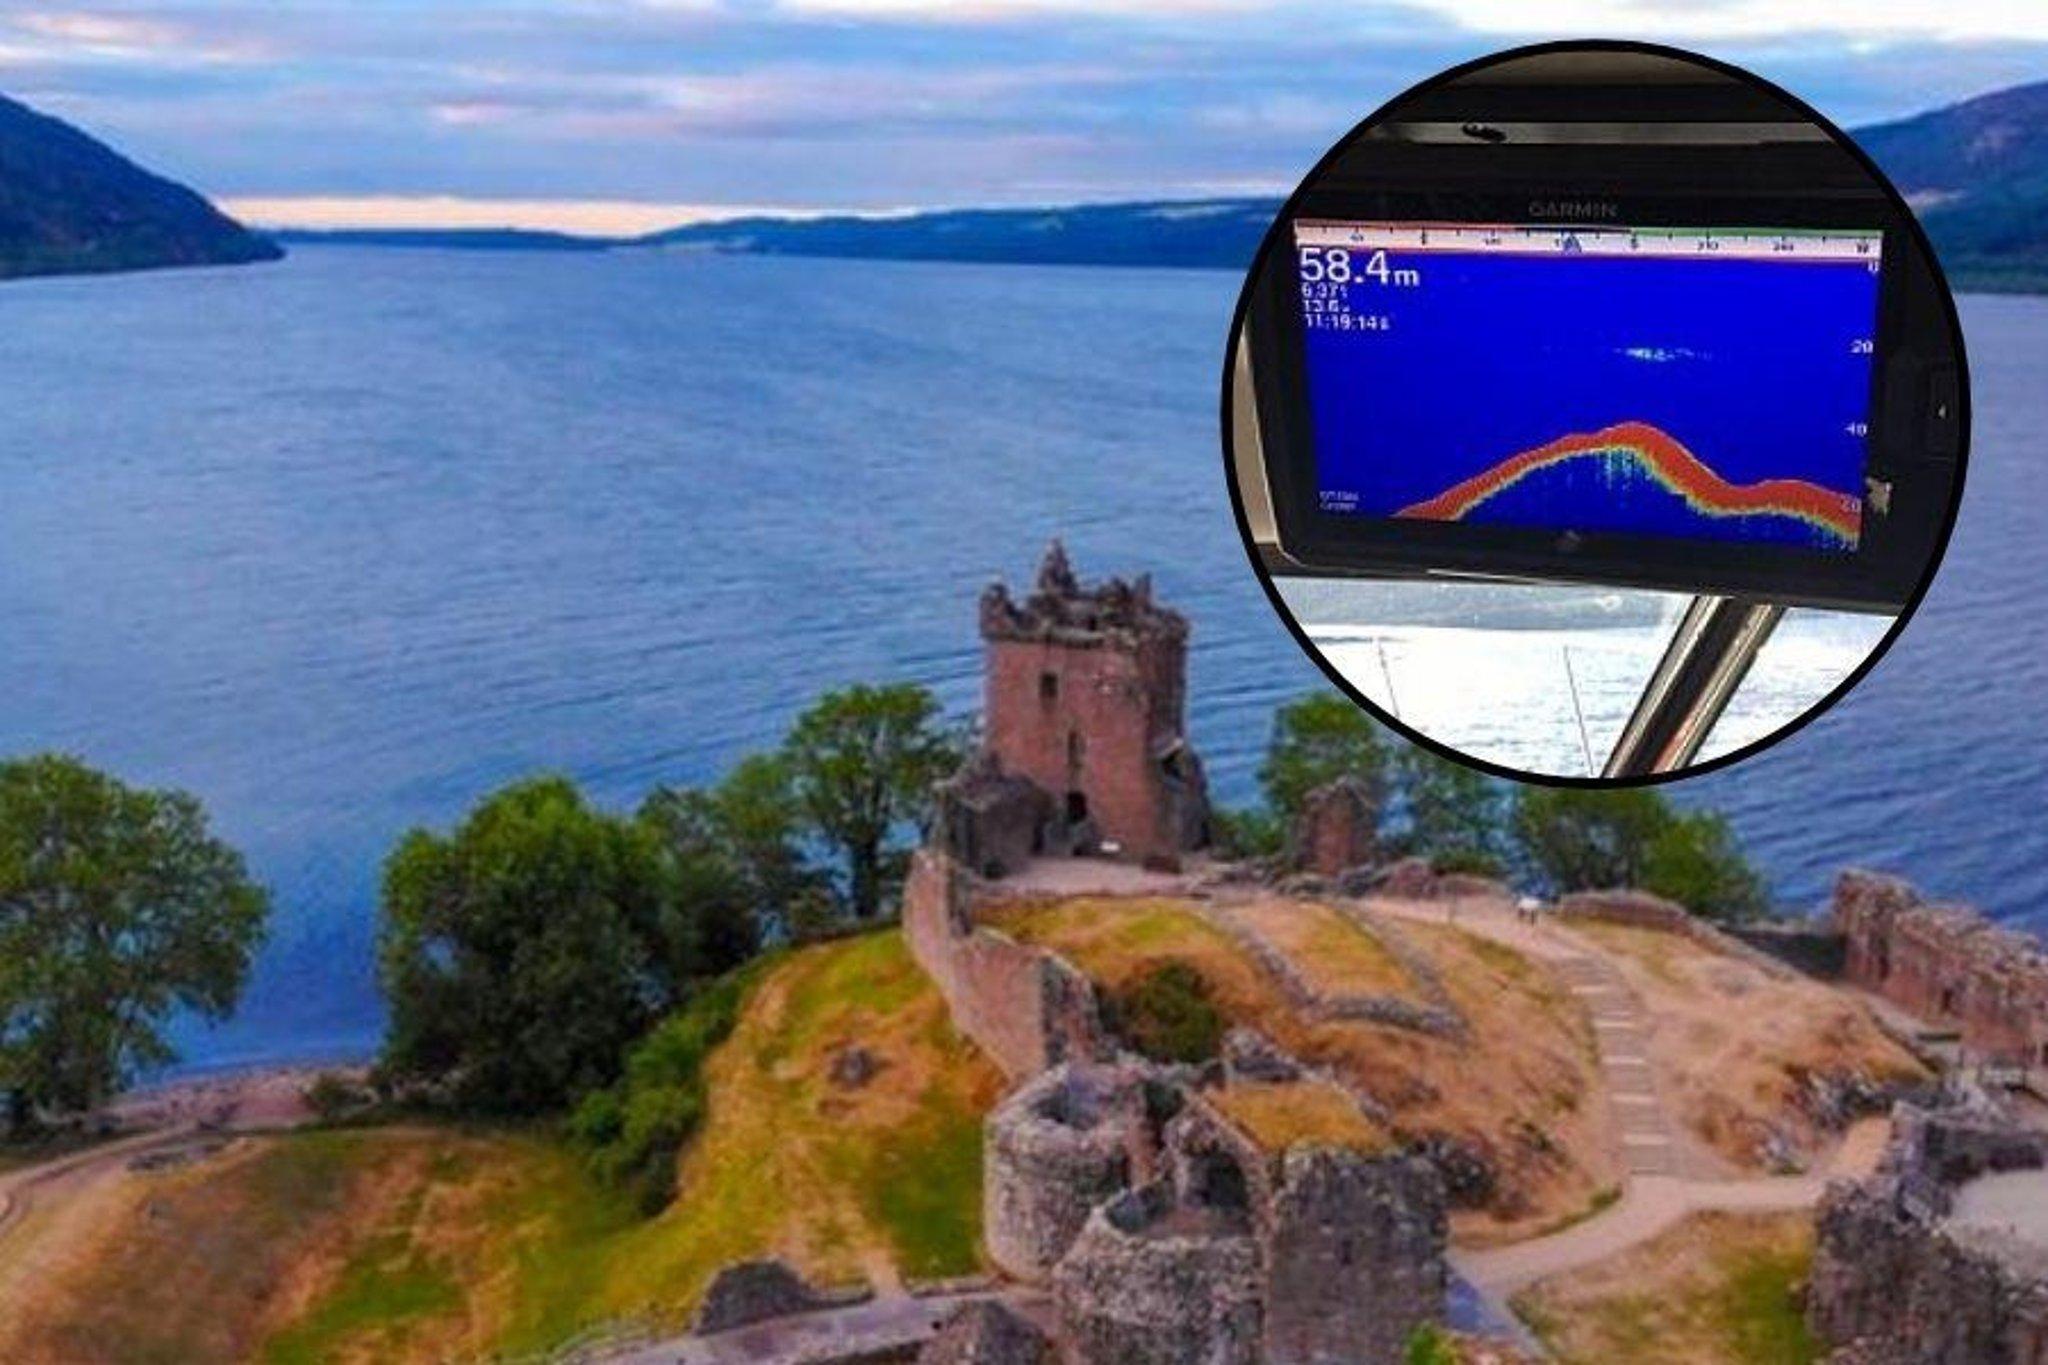 Loch Ness Monster: New sonar images capture deep water activity   The  Scotsman